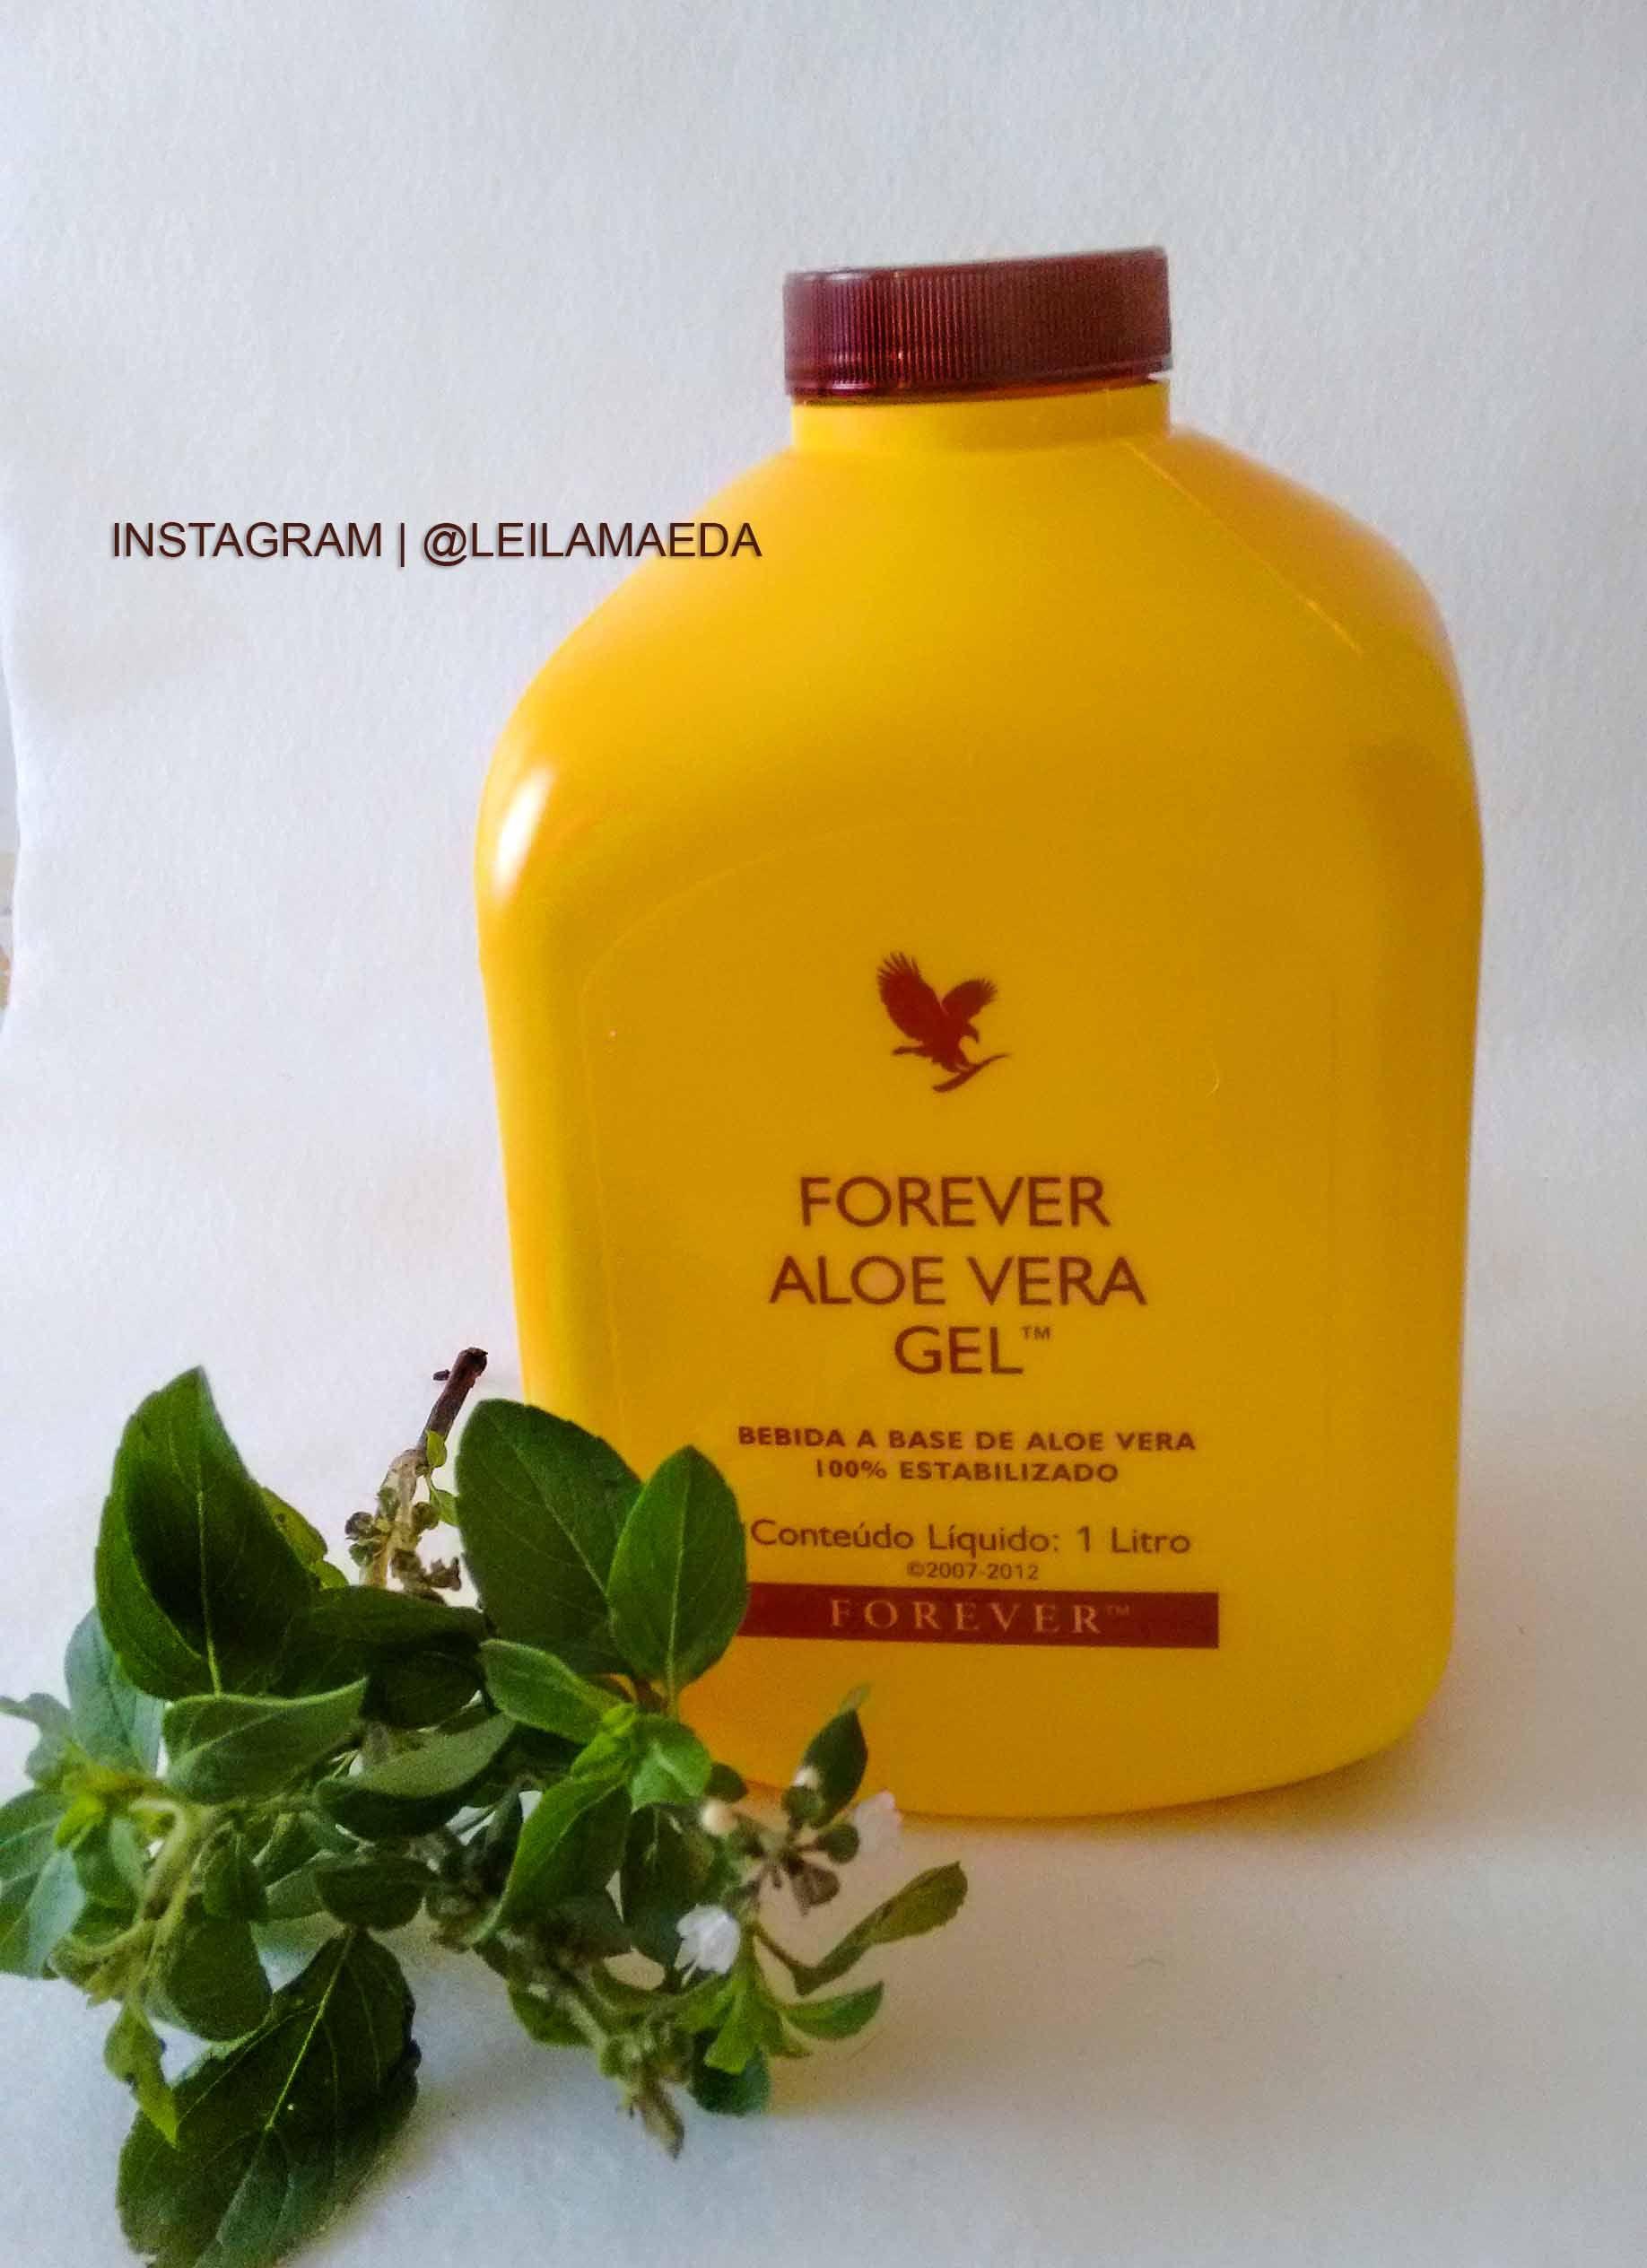 Aloe Vera Gel Cod15 Bebida Feita Do Puro Gel De Aloe Rico Em